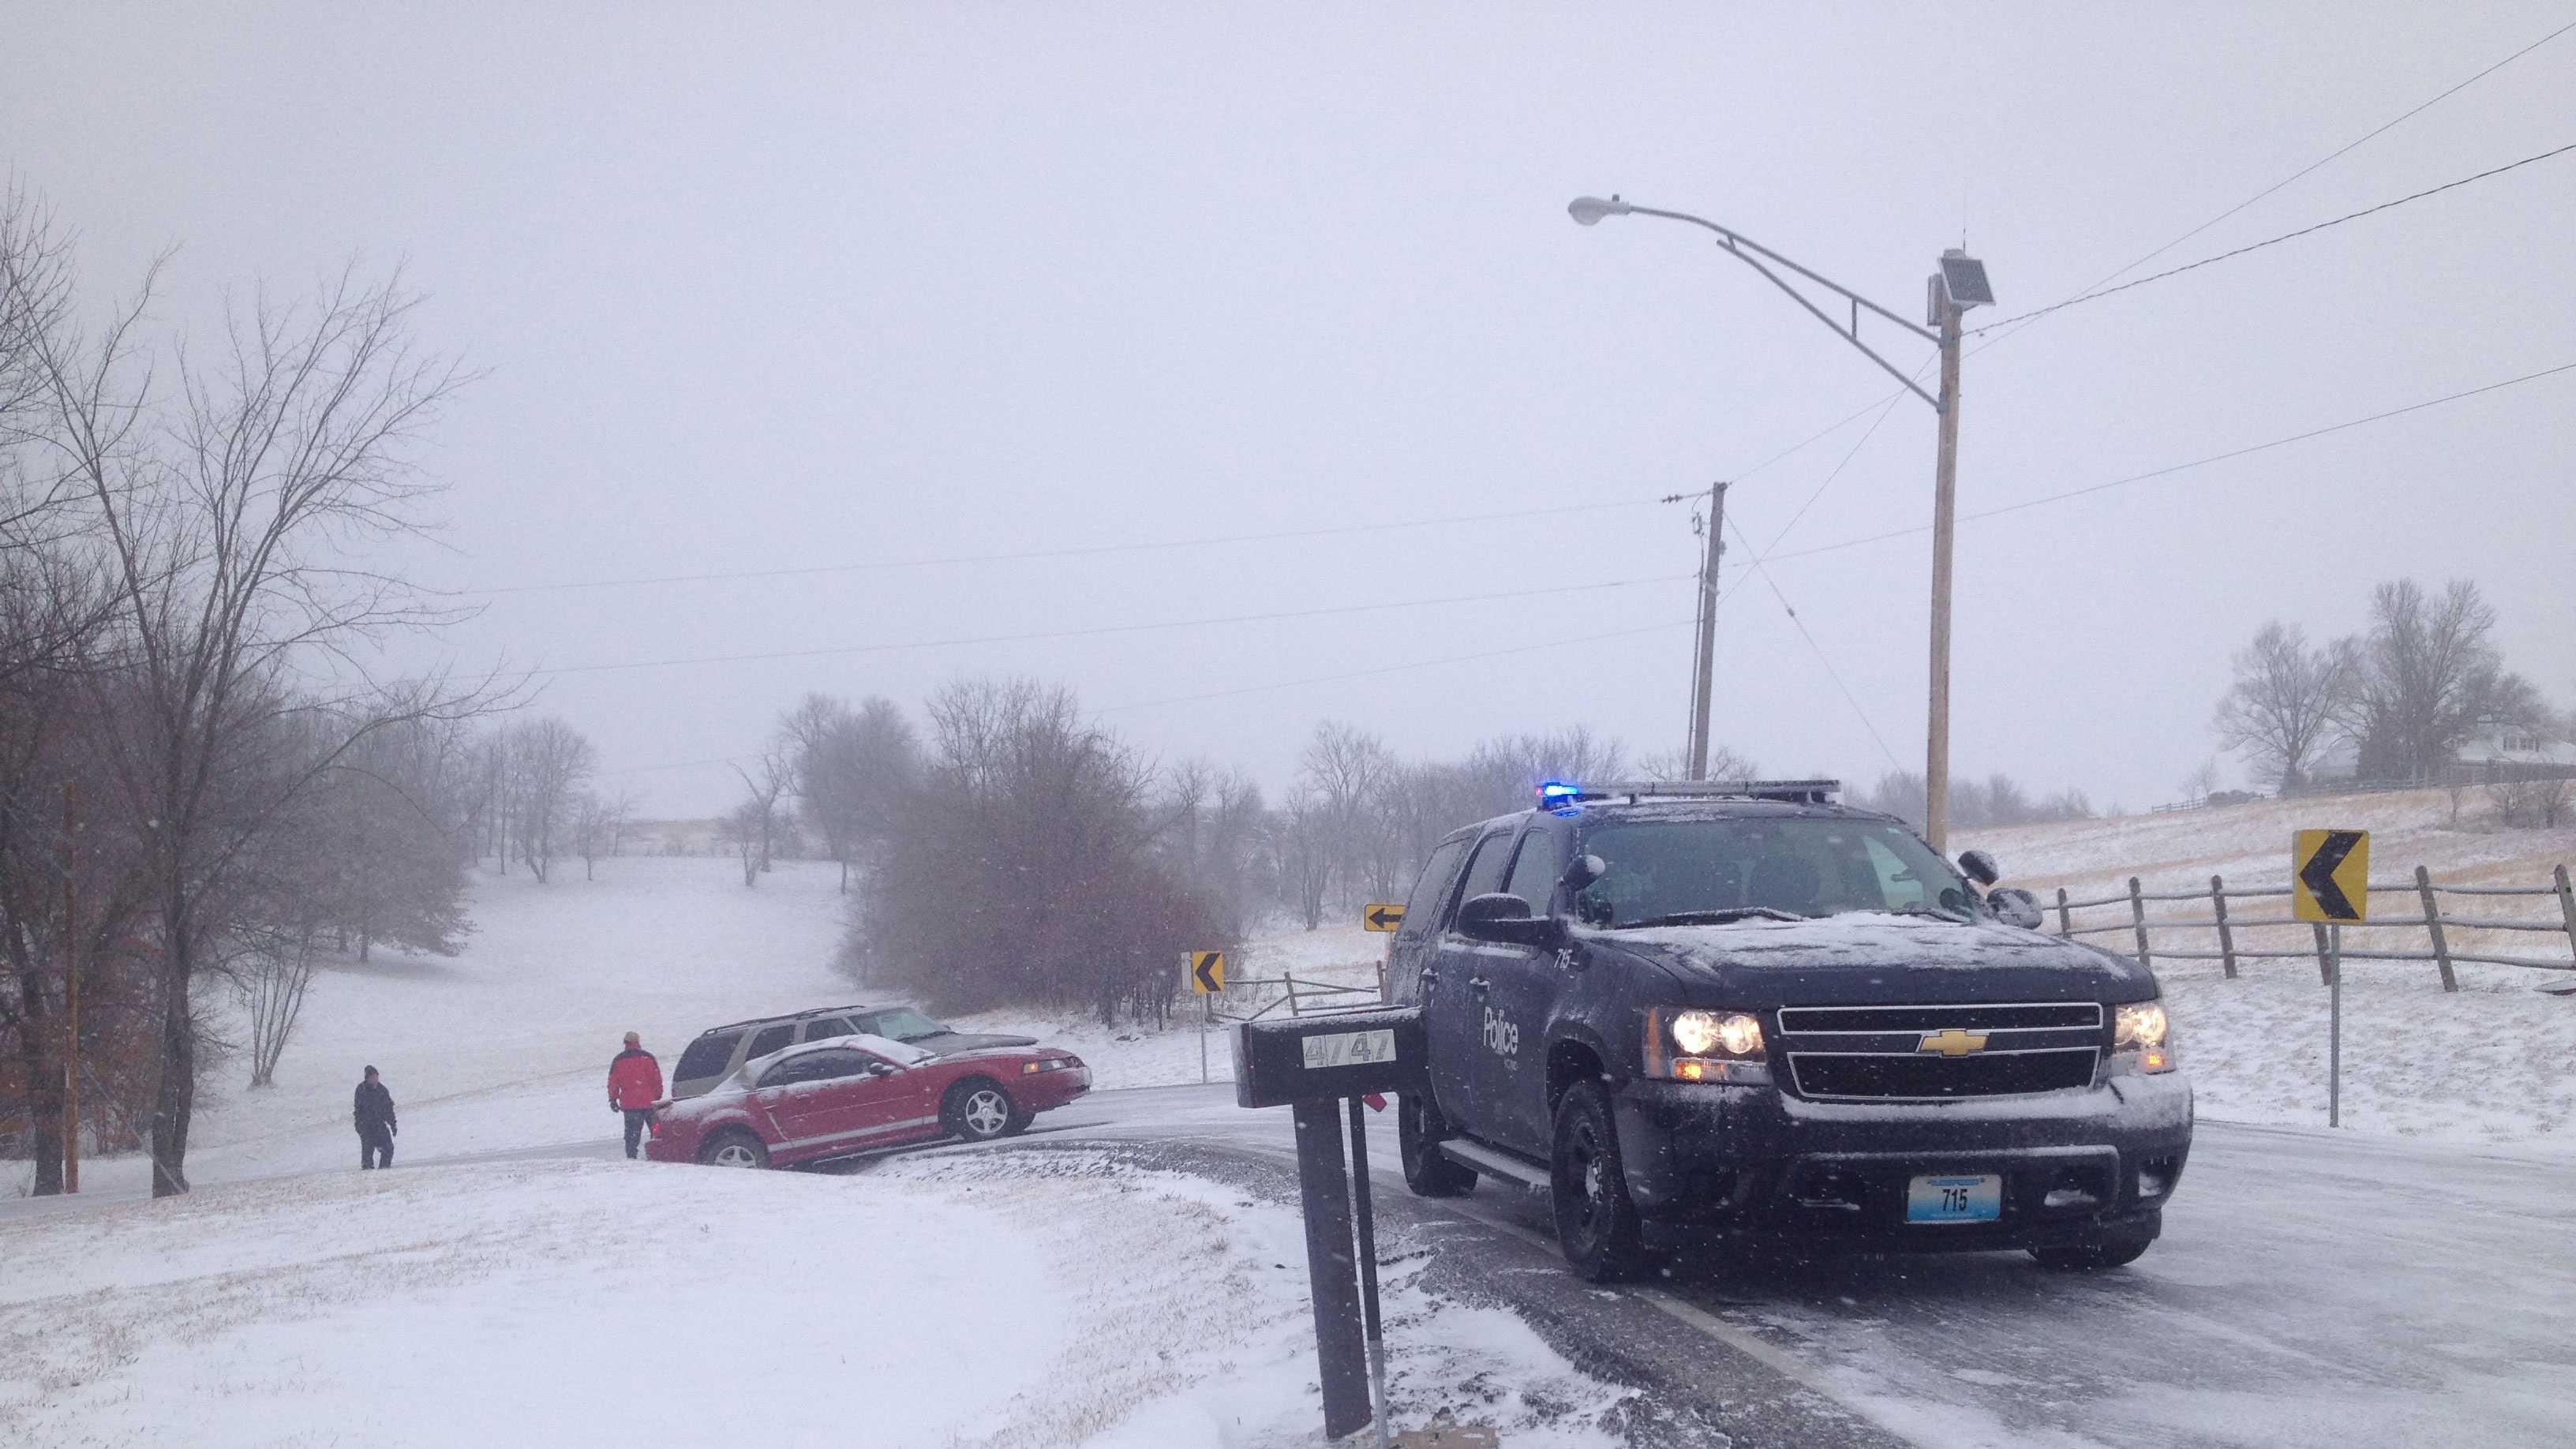 Wreck near Staley High School image 2